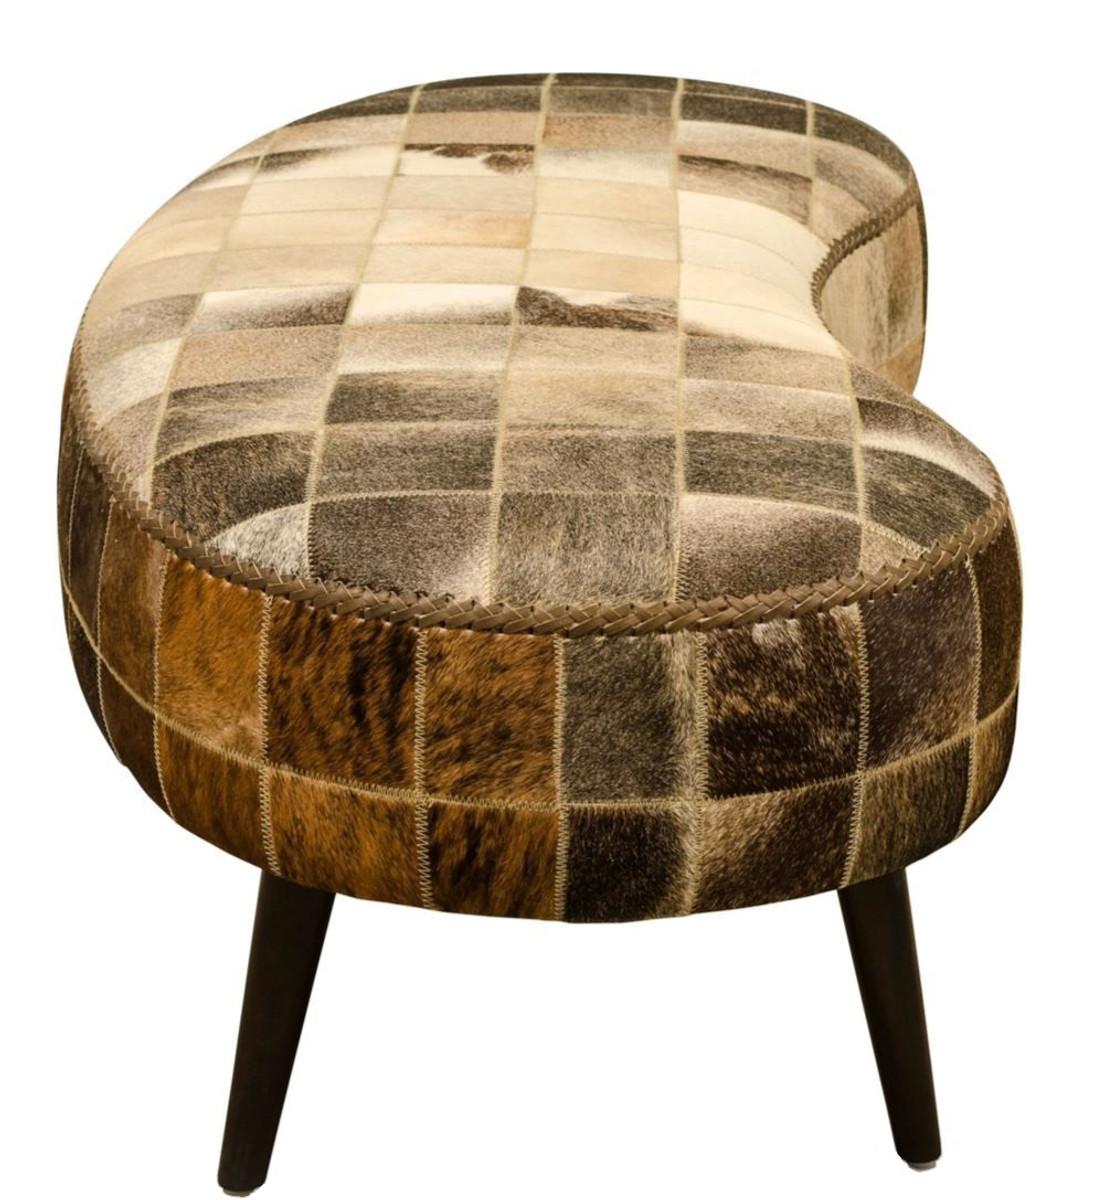 Casa Padrino Luxus Sitzbank mit Kuhfell 130 x 60 x H. 50 cm - Designermöbel 3